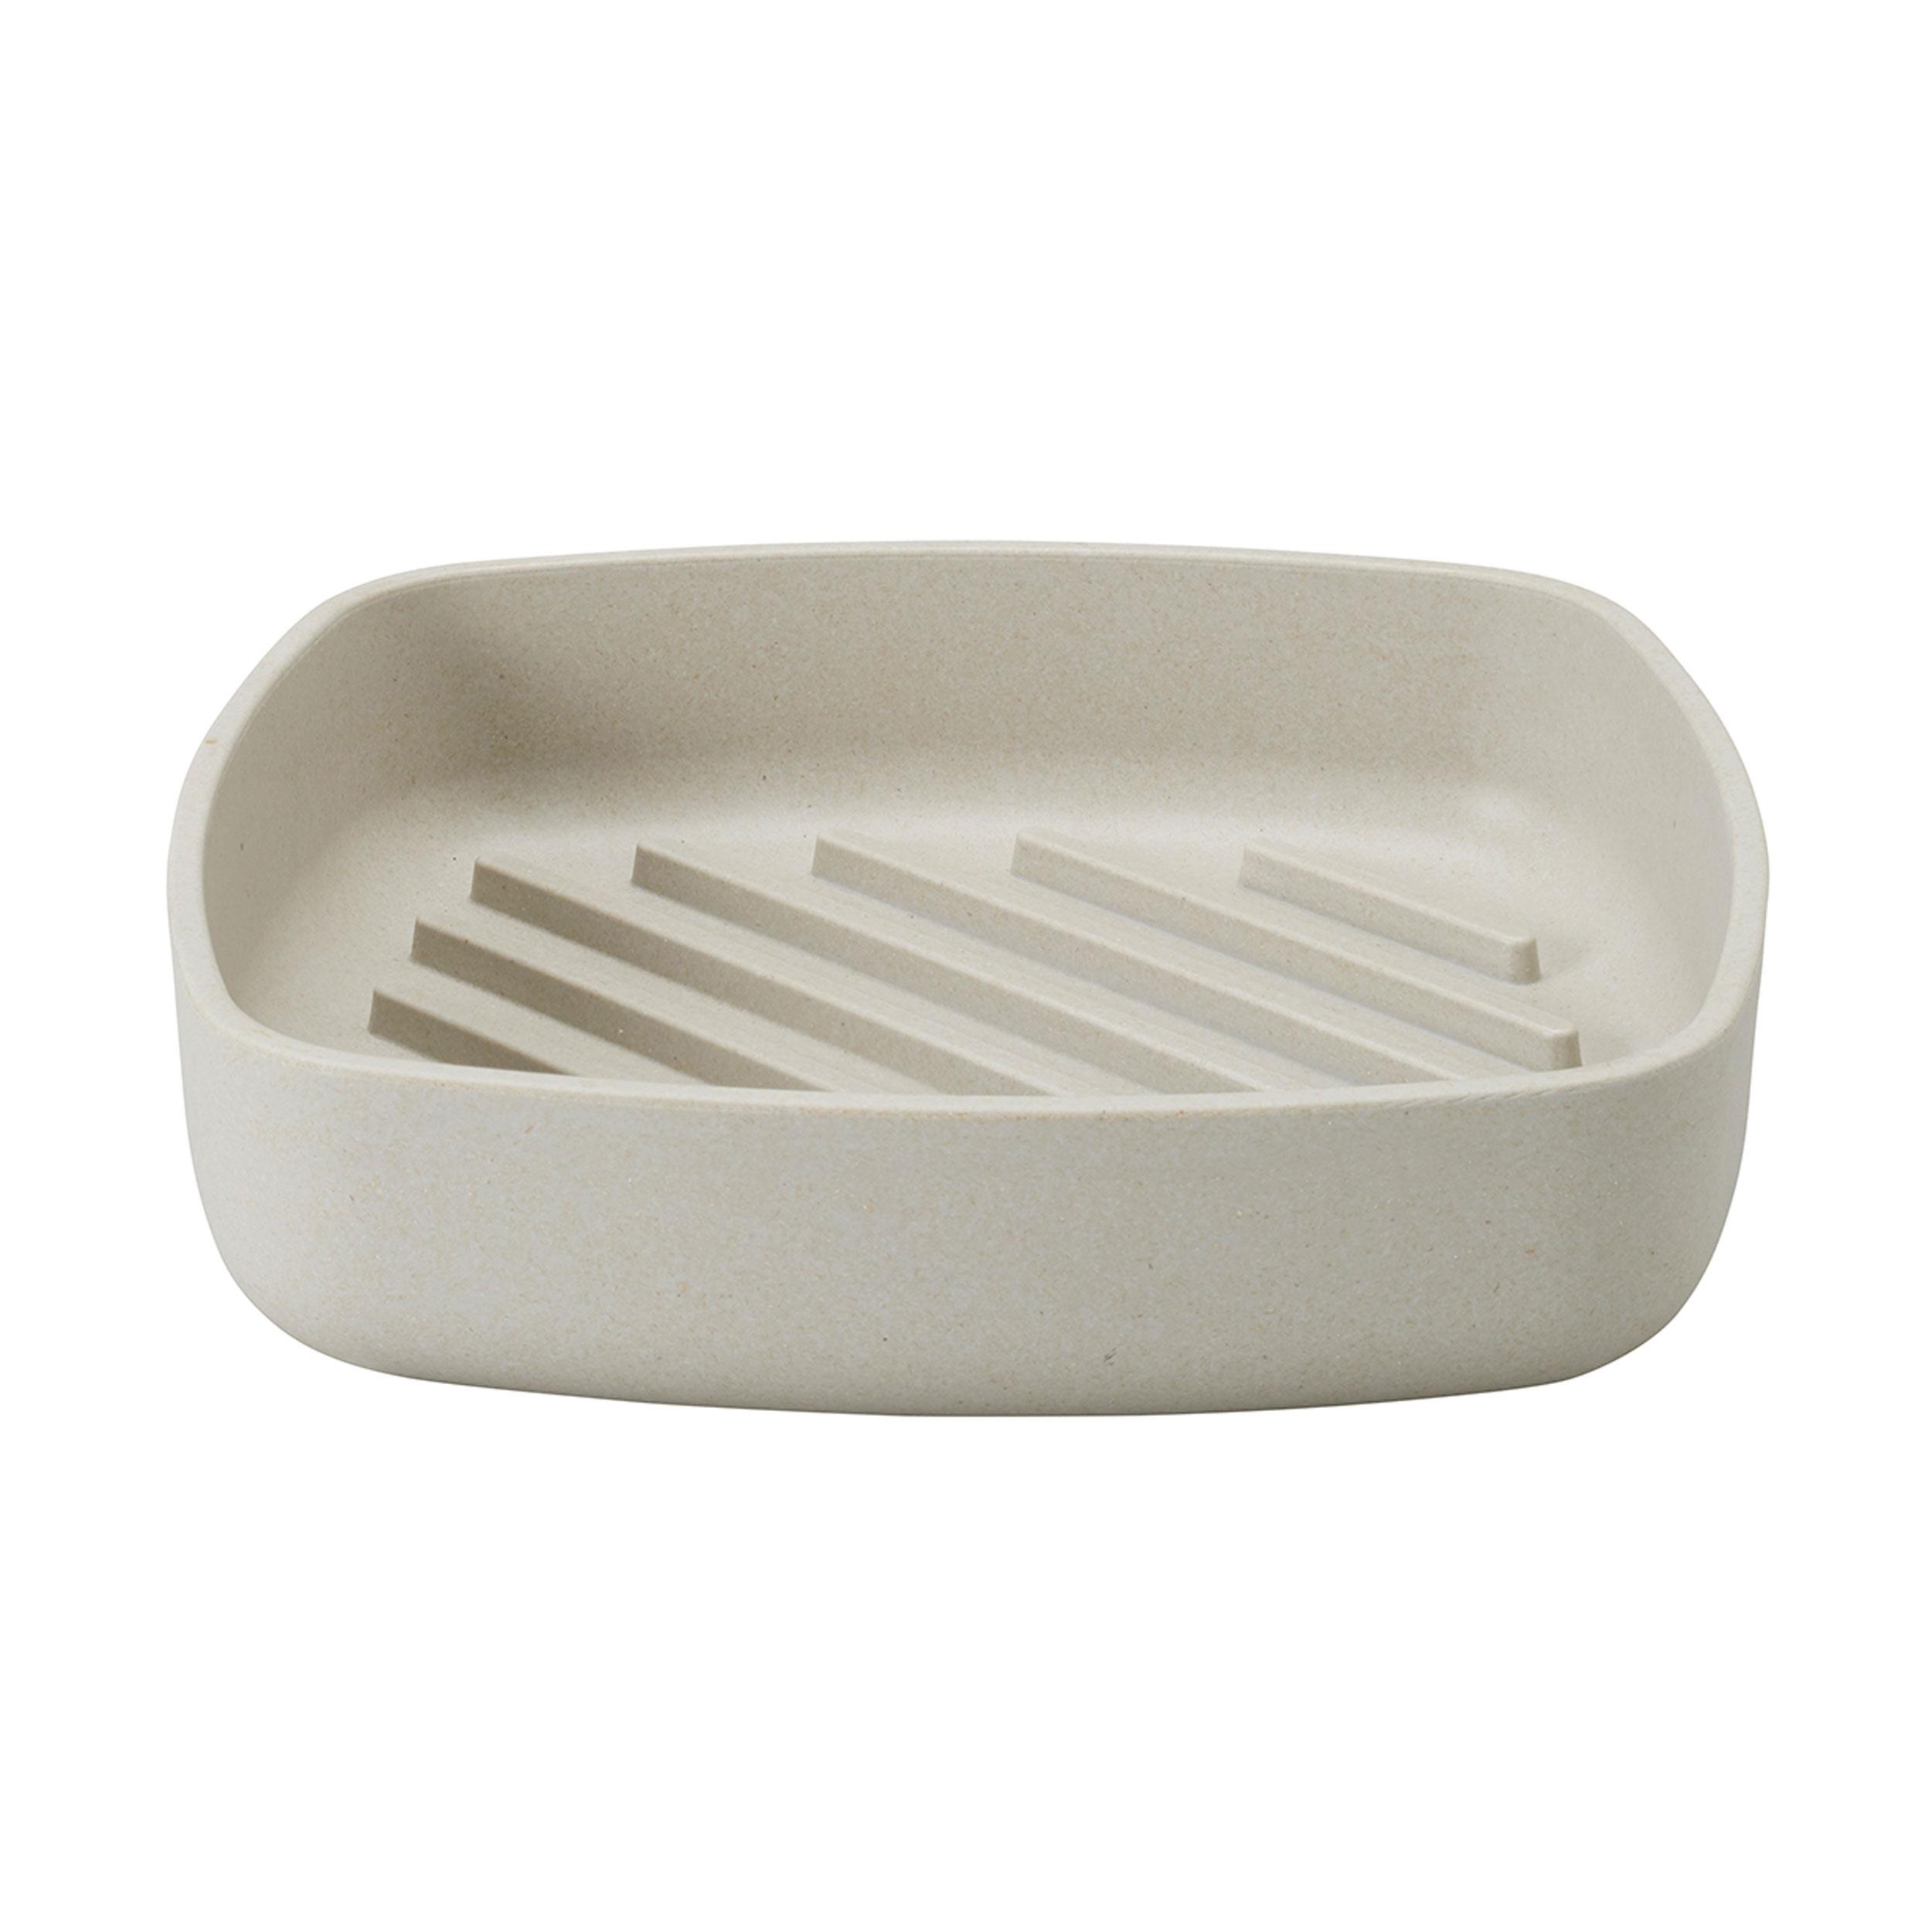 Stelton Brotkorb rig tig tray it bread tray bowl box breadbasket melamine grey